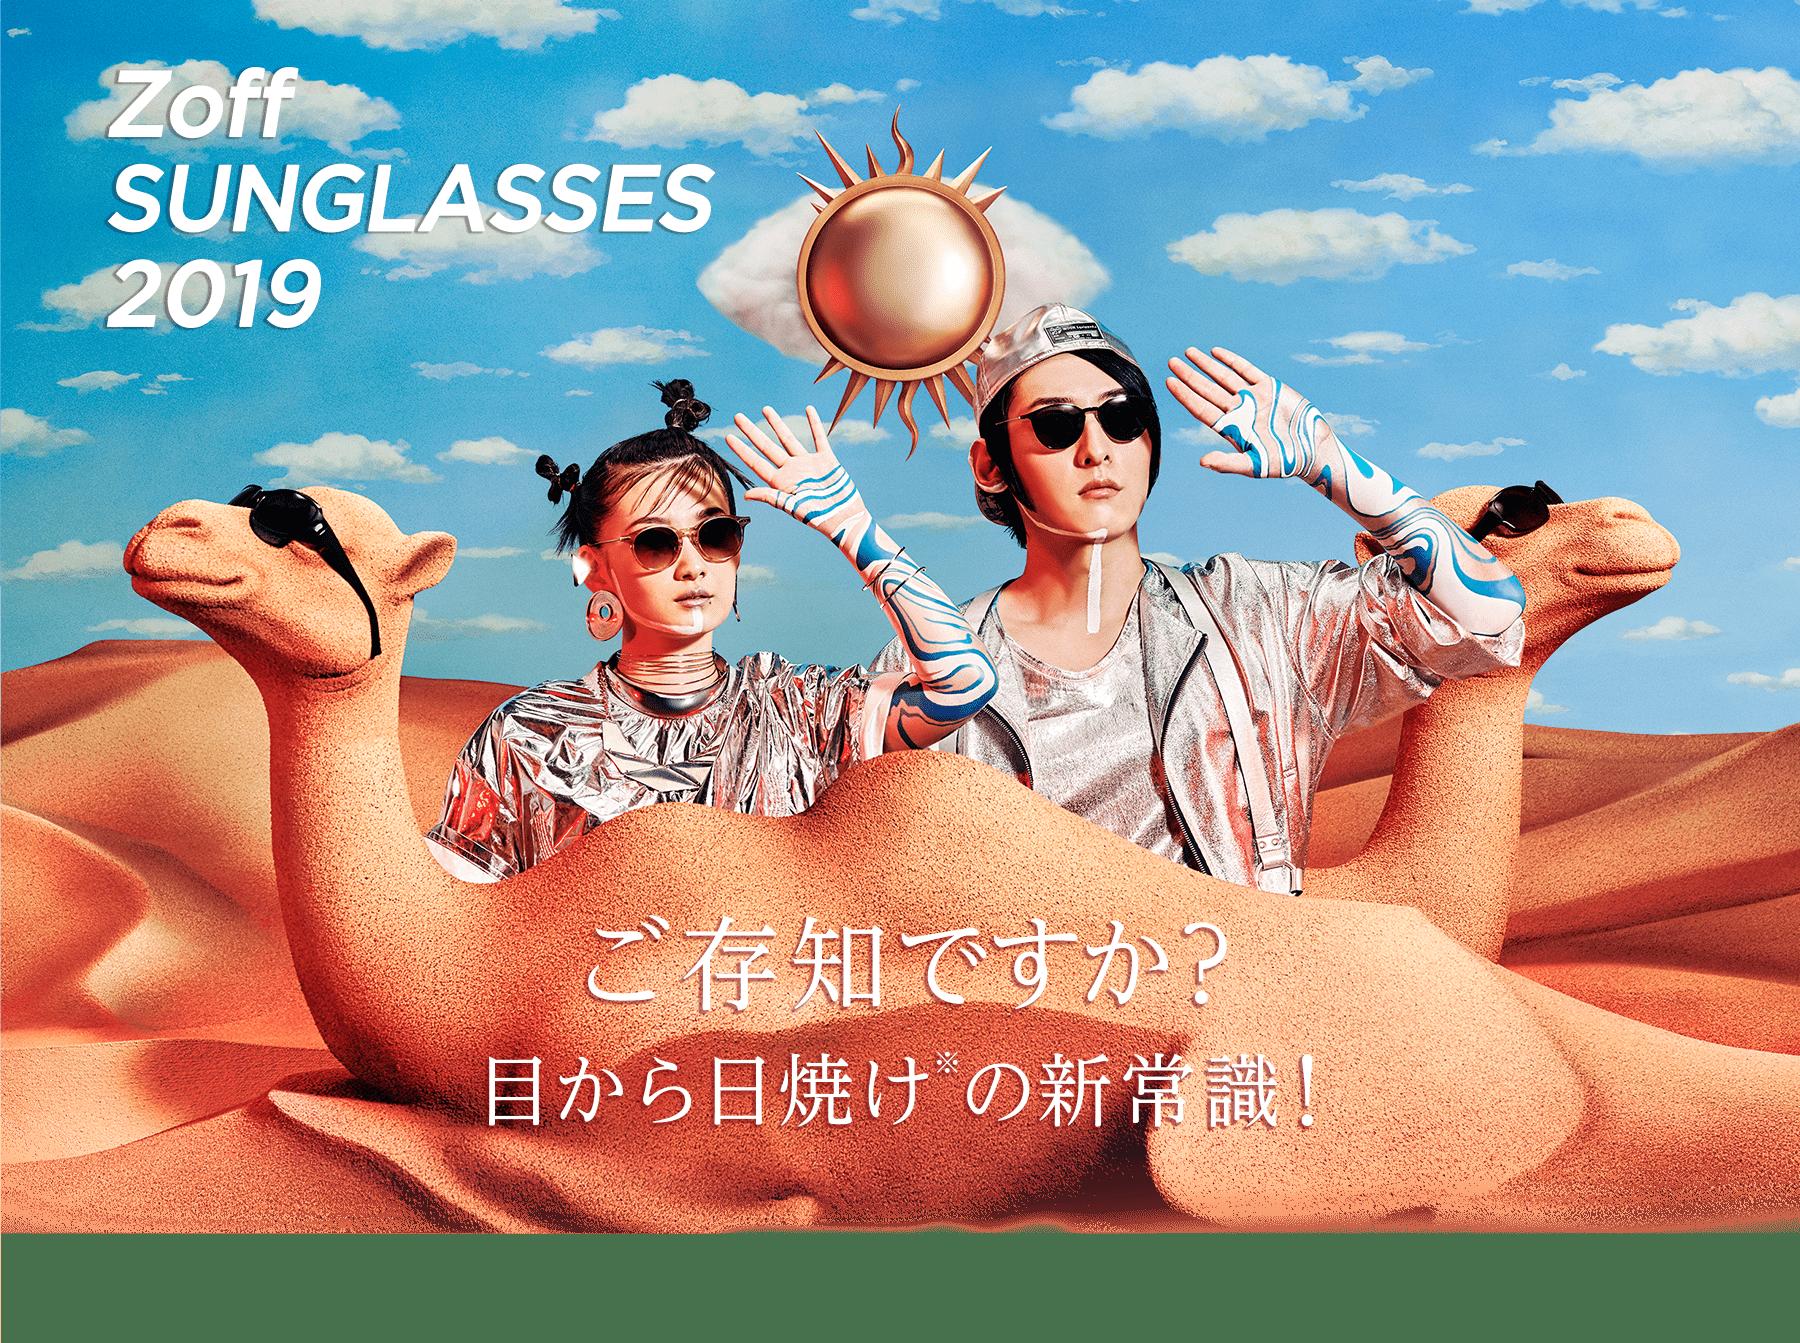 Zoff SUNGLASSES 2019 ご存知ですか?目から日焼け※の新常識!